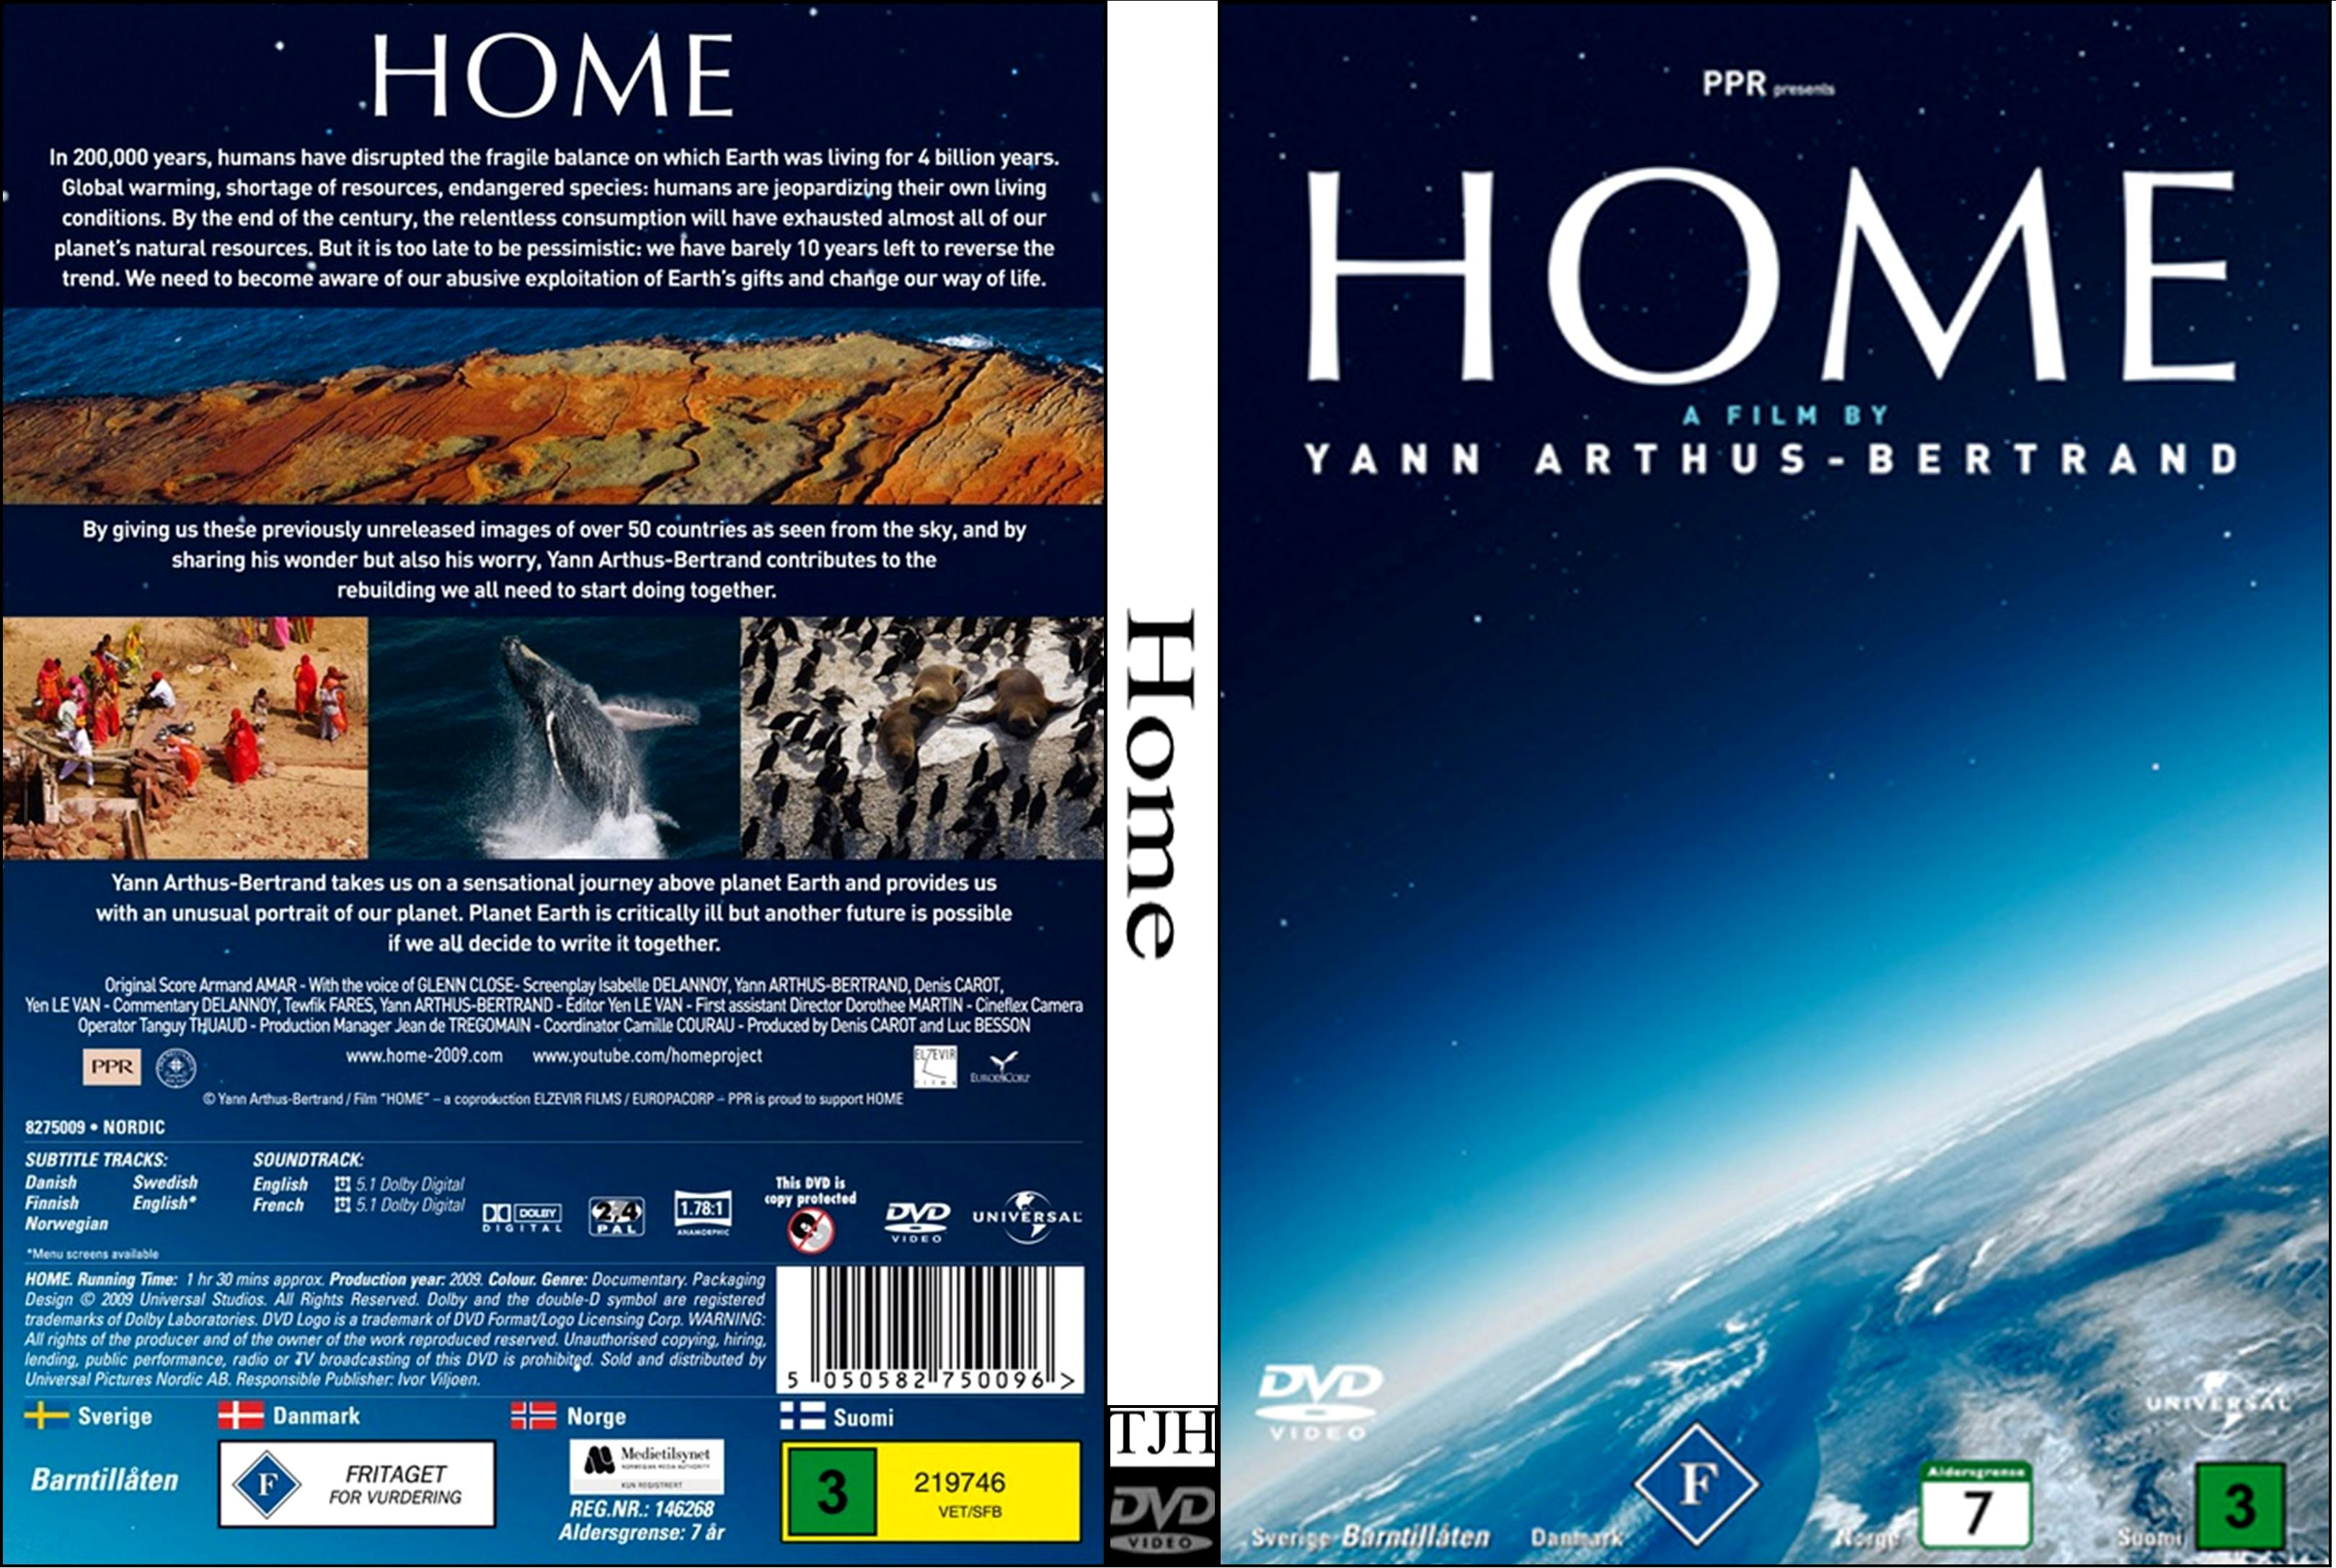 Home (yann arthus bertrand 2009)